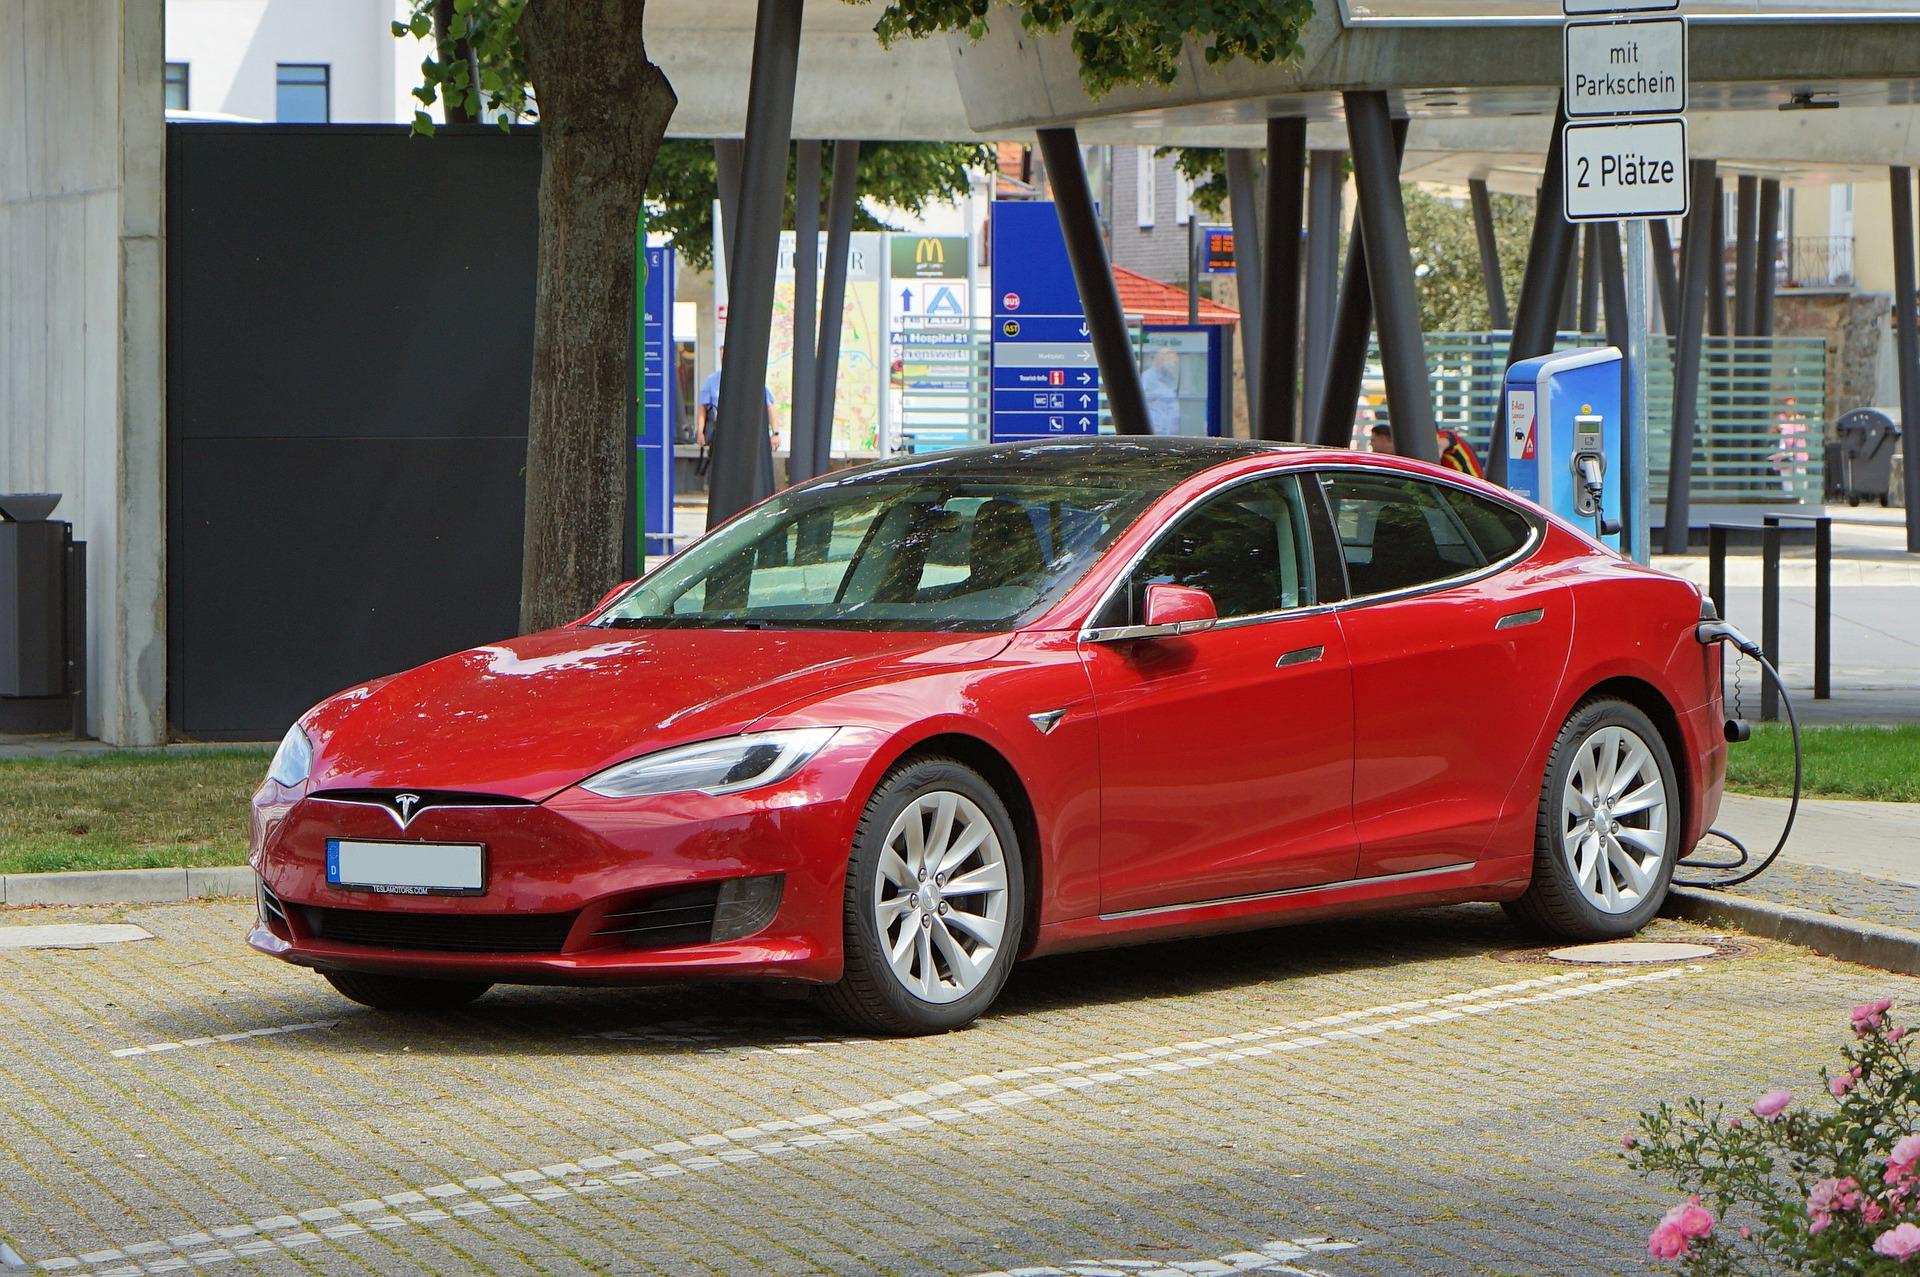 nabíjanie červeného auta Tesla